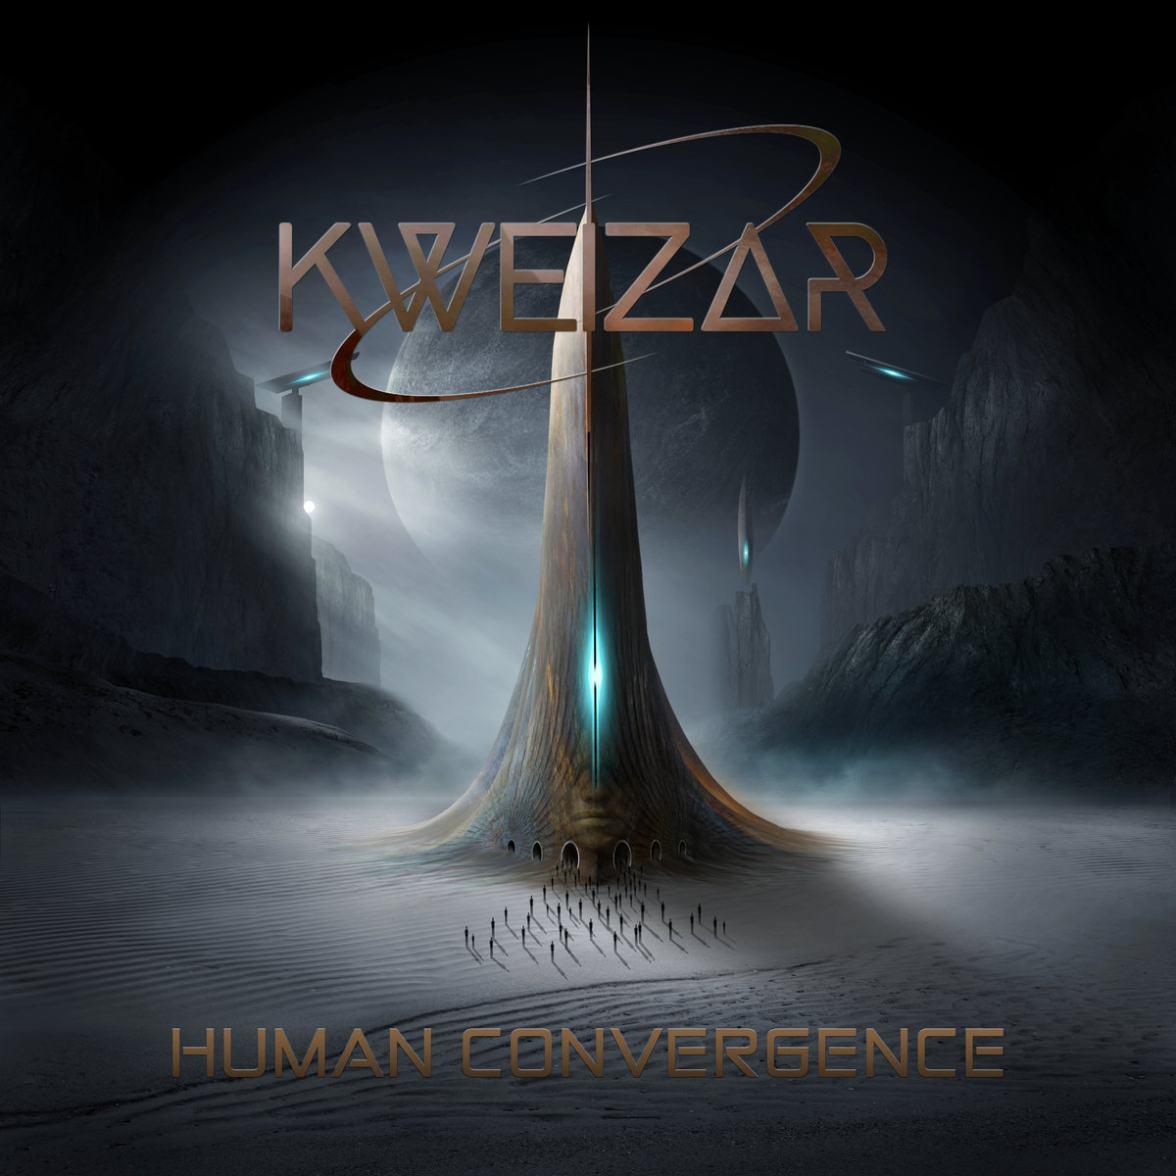 Kweizar - Human Convergence